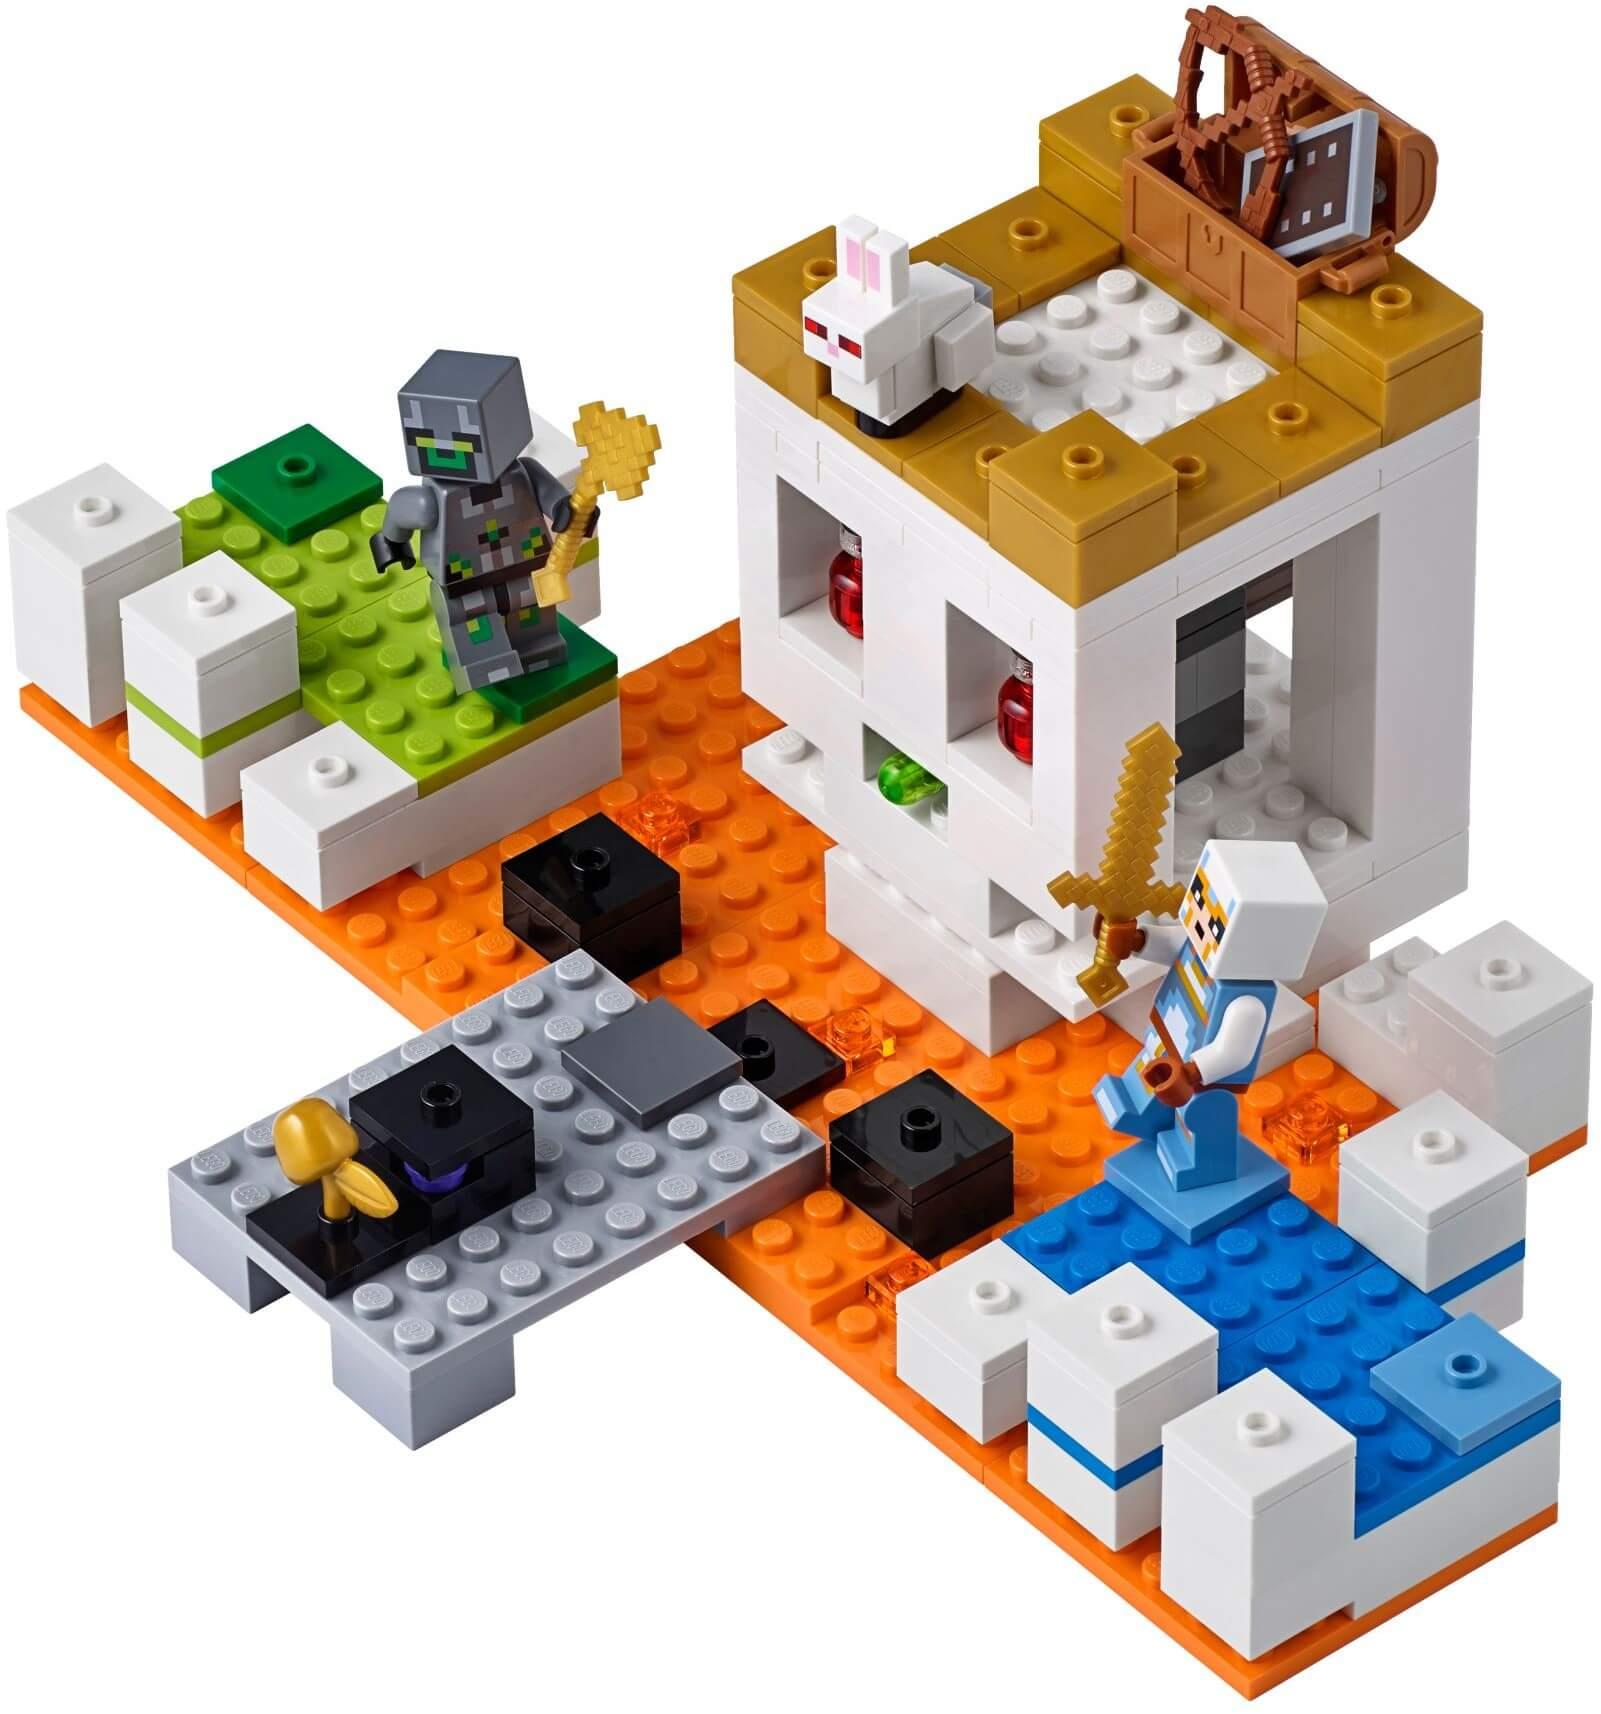 Mua đồ chơi LEGO 21145 - LEGO Minecraft 21145 - Đấu Trường Đầu Lâu (LEGO 21145 The Skull Arena)